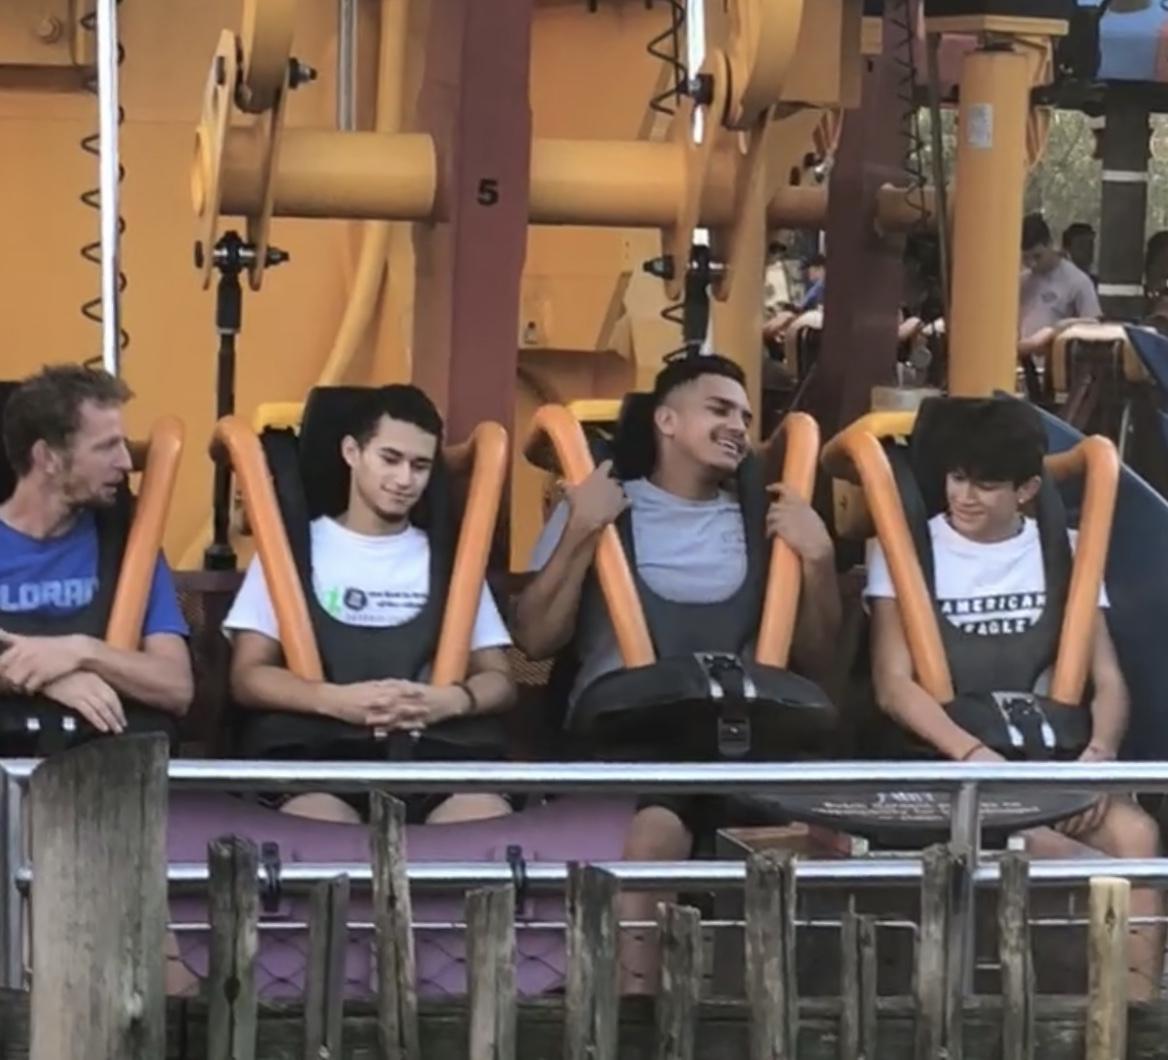 Senior, Jozaiah Cotto, was told to go on a roller coaster by Senior, Juan Viruet, and Junior, Javier Martinez.